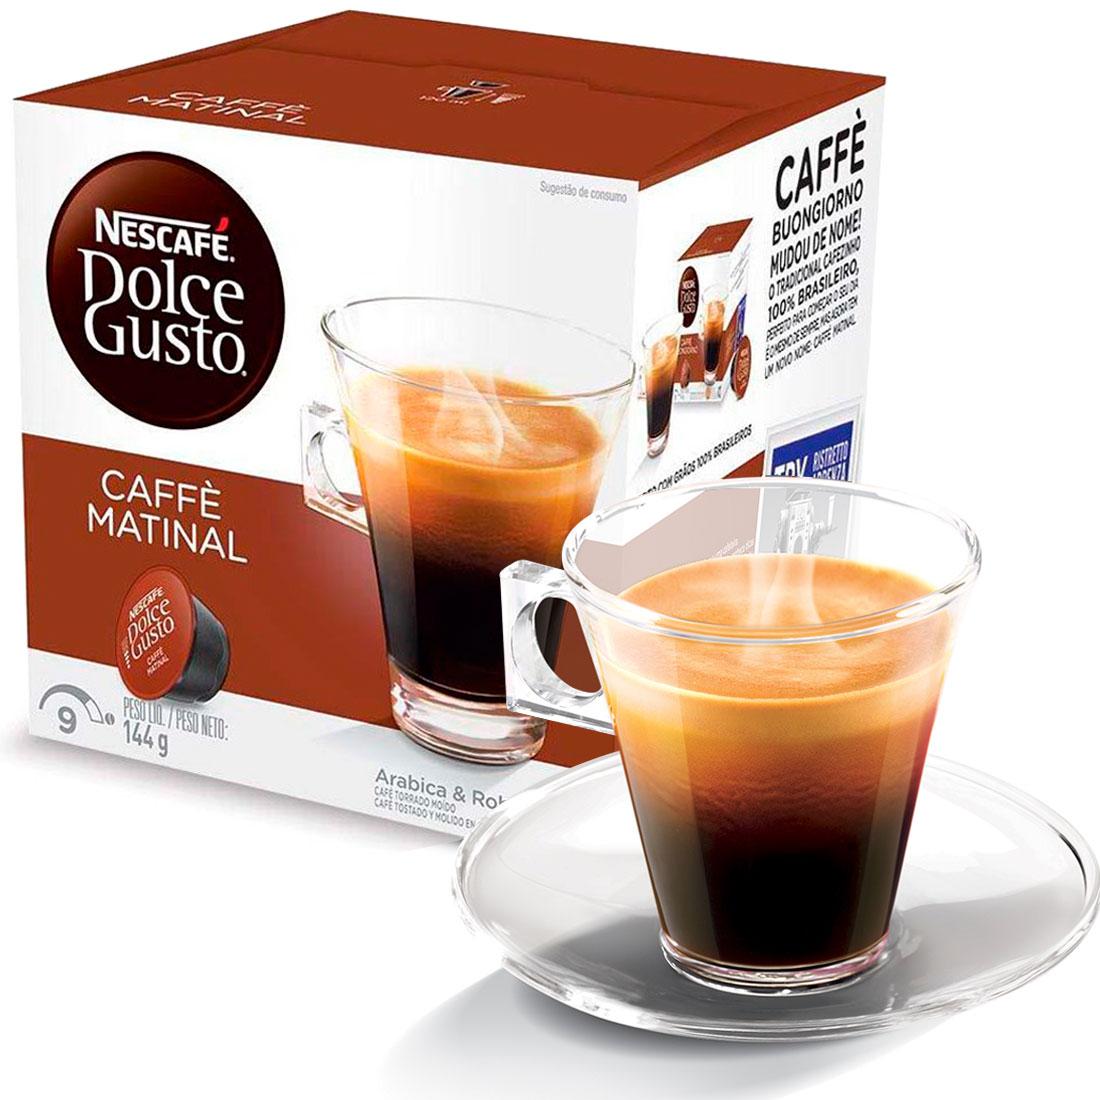 Cápsula Nescafé Dolce Gusto Caffè Matinal 16 Cápsulas - Nestlé